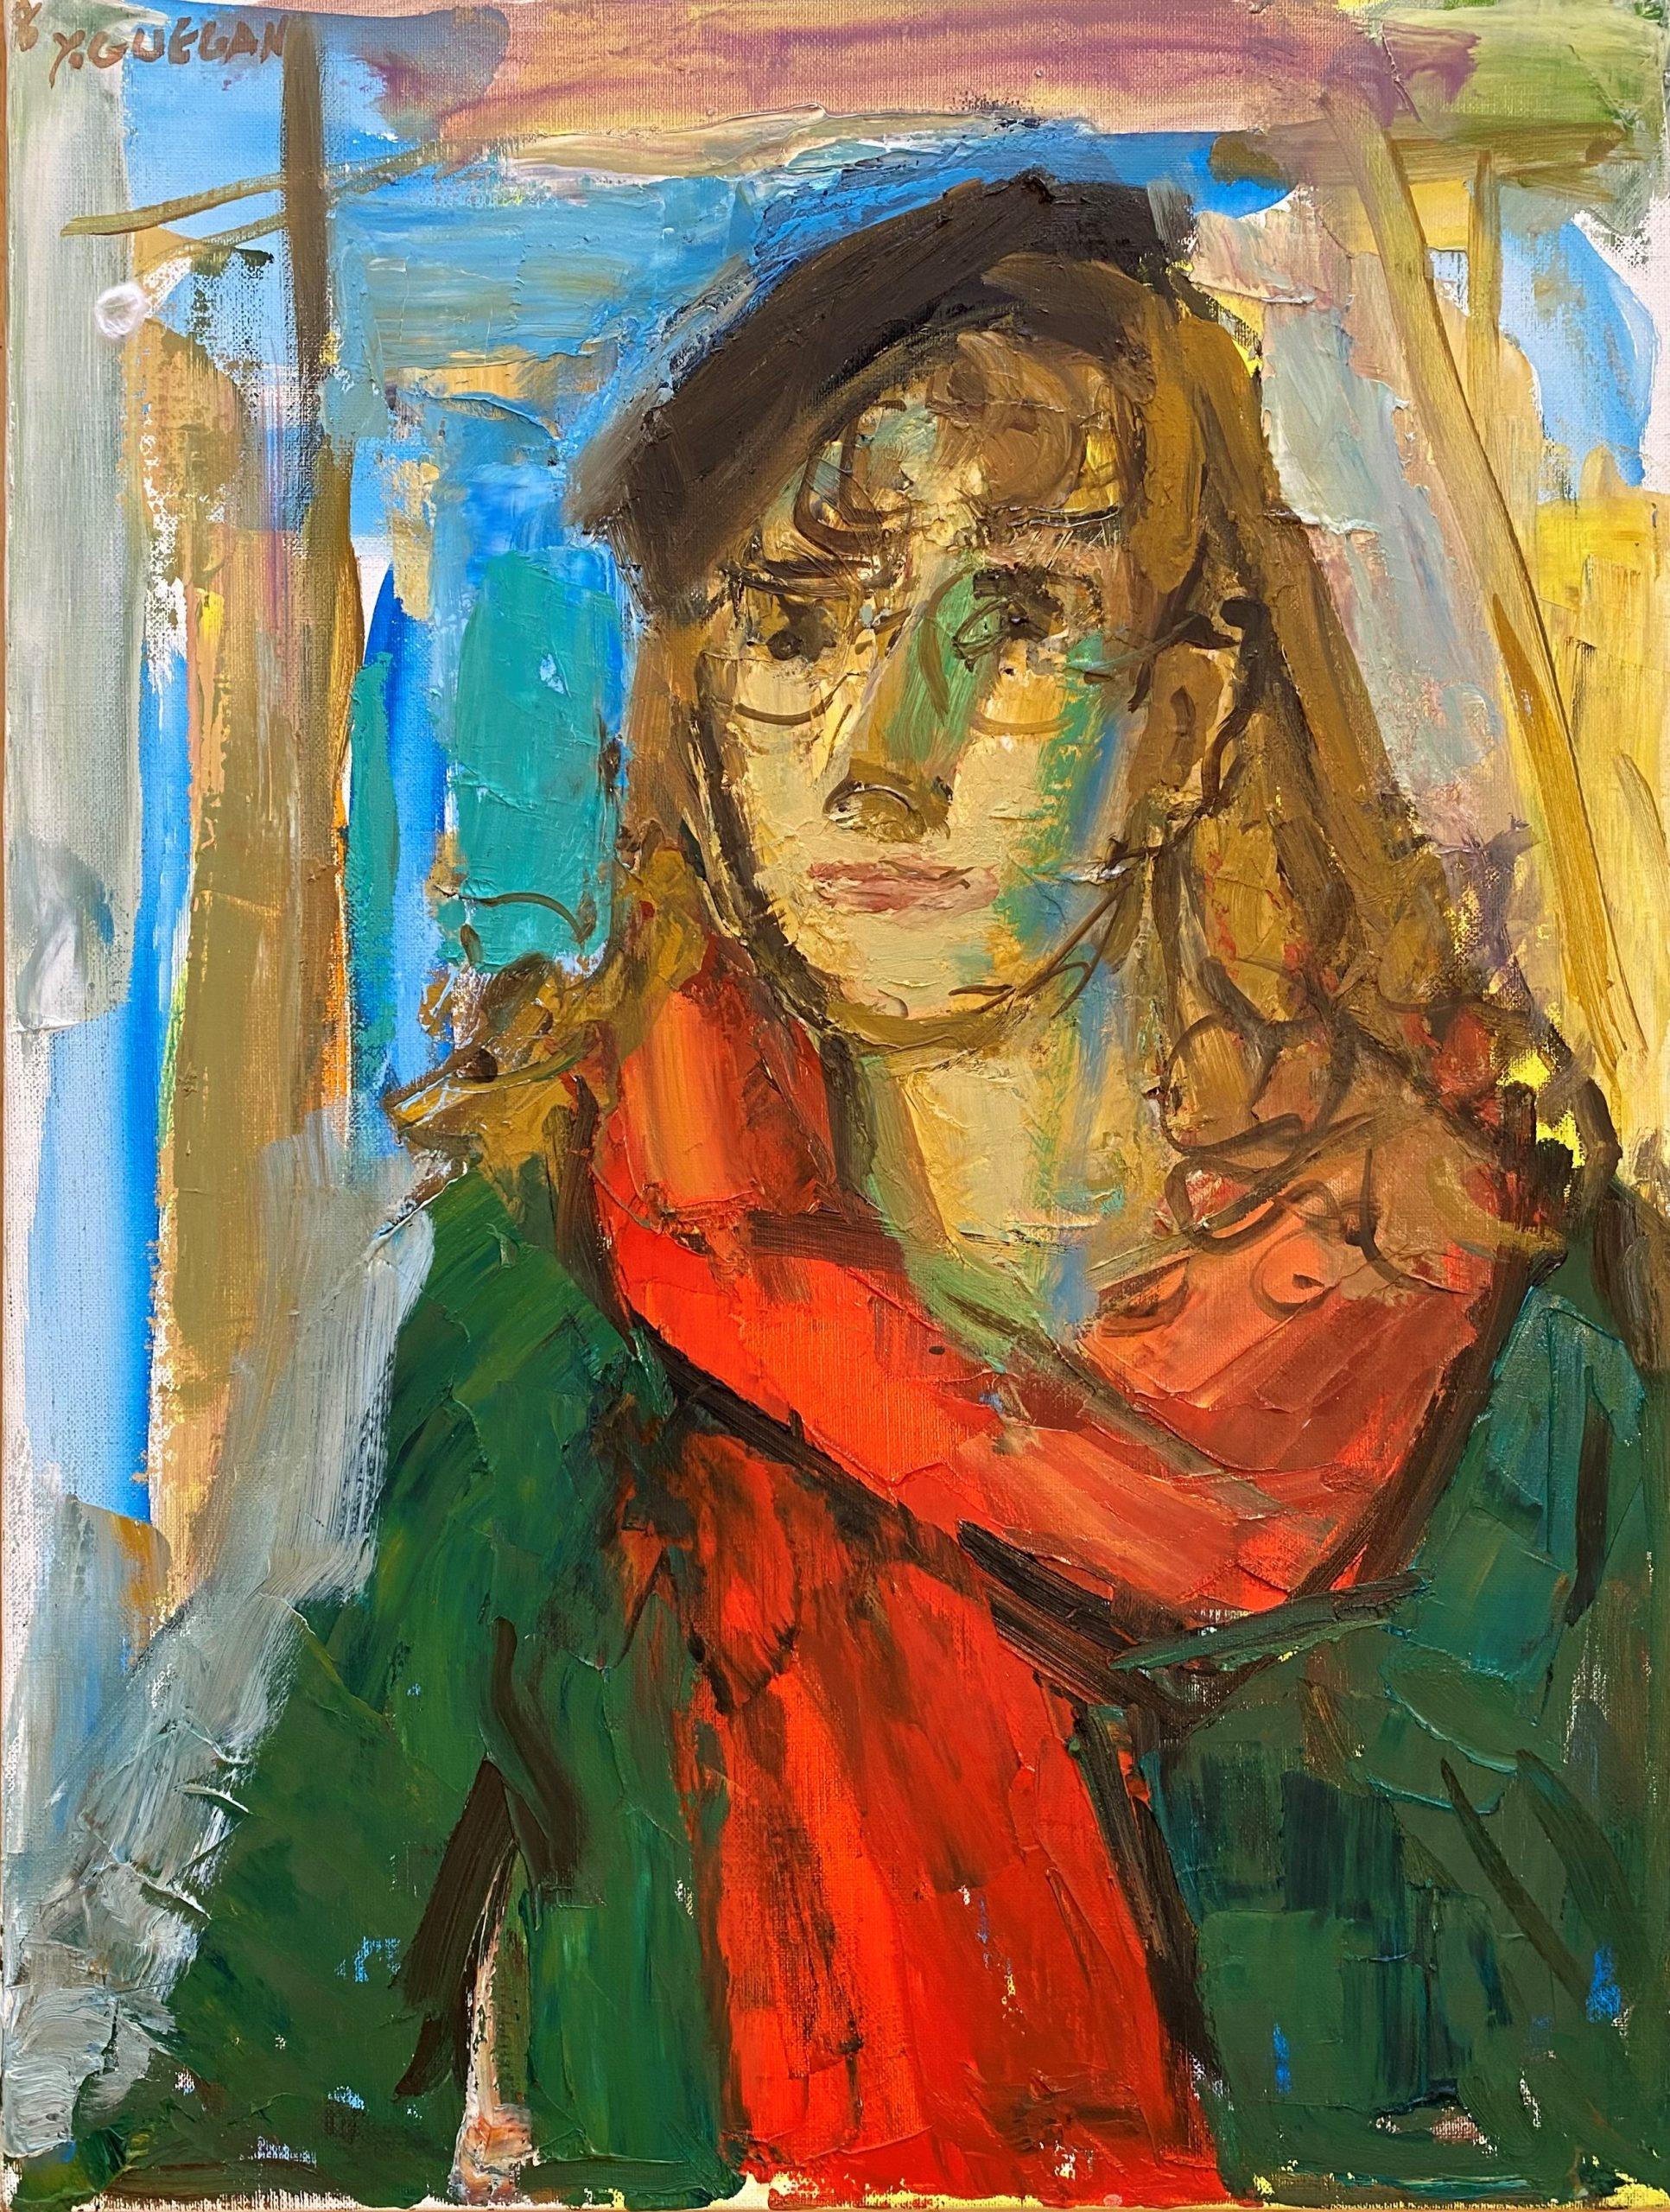 Yvonne guégan a la galerie danielle bourdette gorzkowski